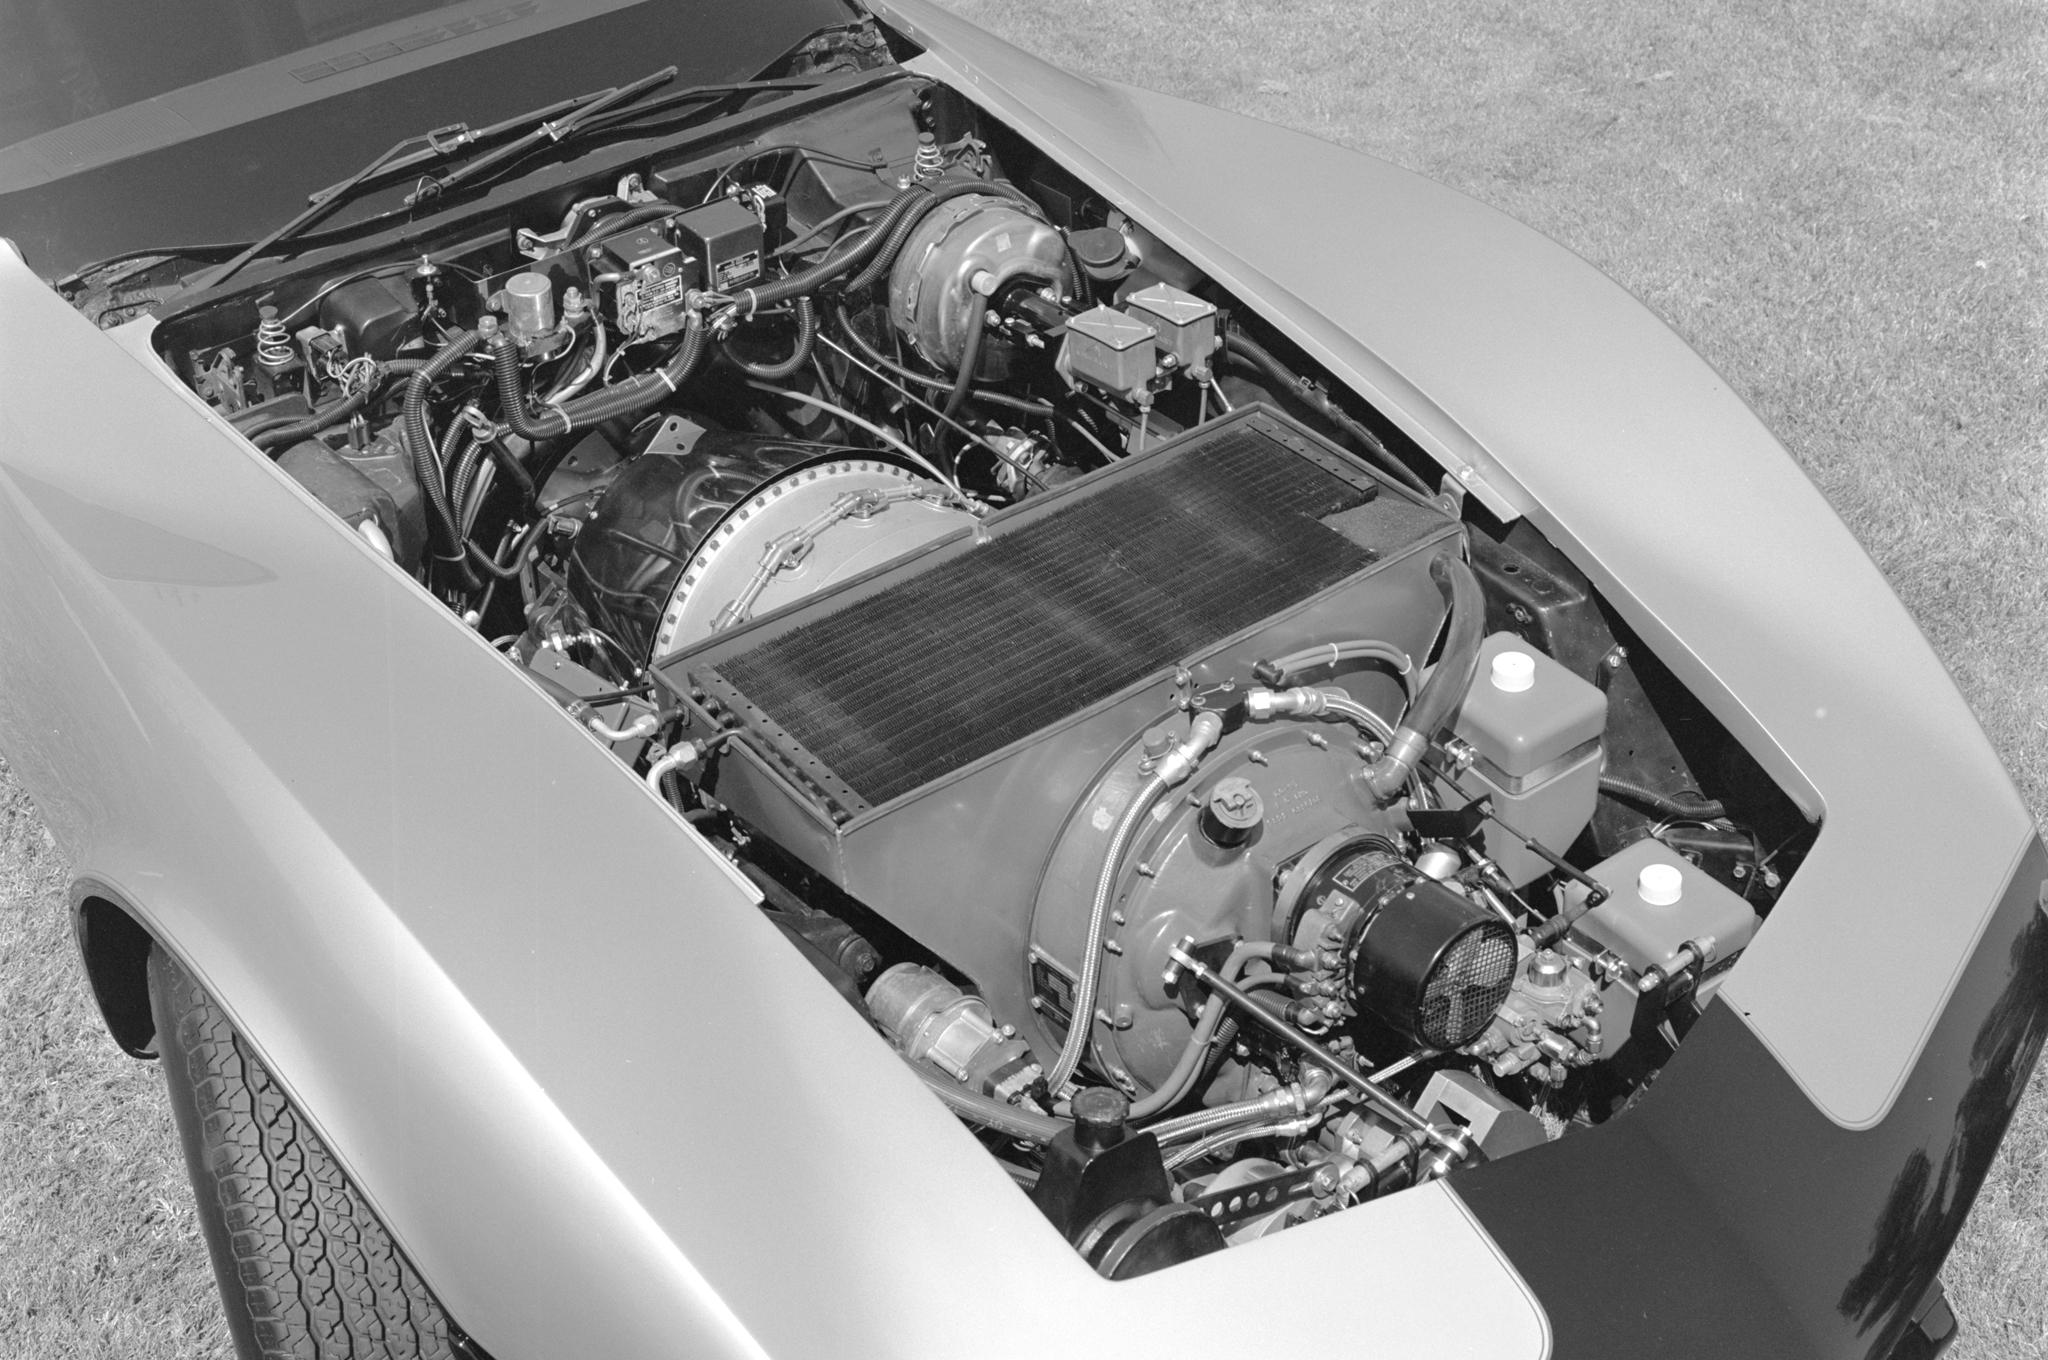 1978-Chevrolet-Corvette-Turbine-by-Vince-Granatelli-engine-02